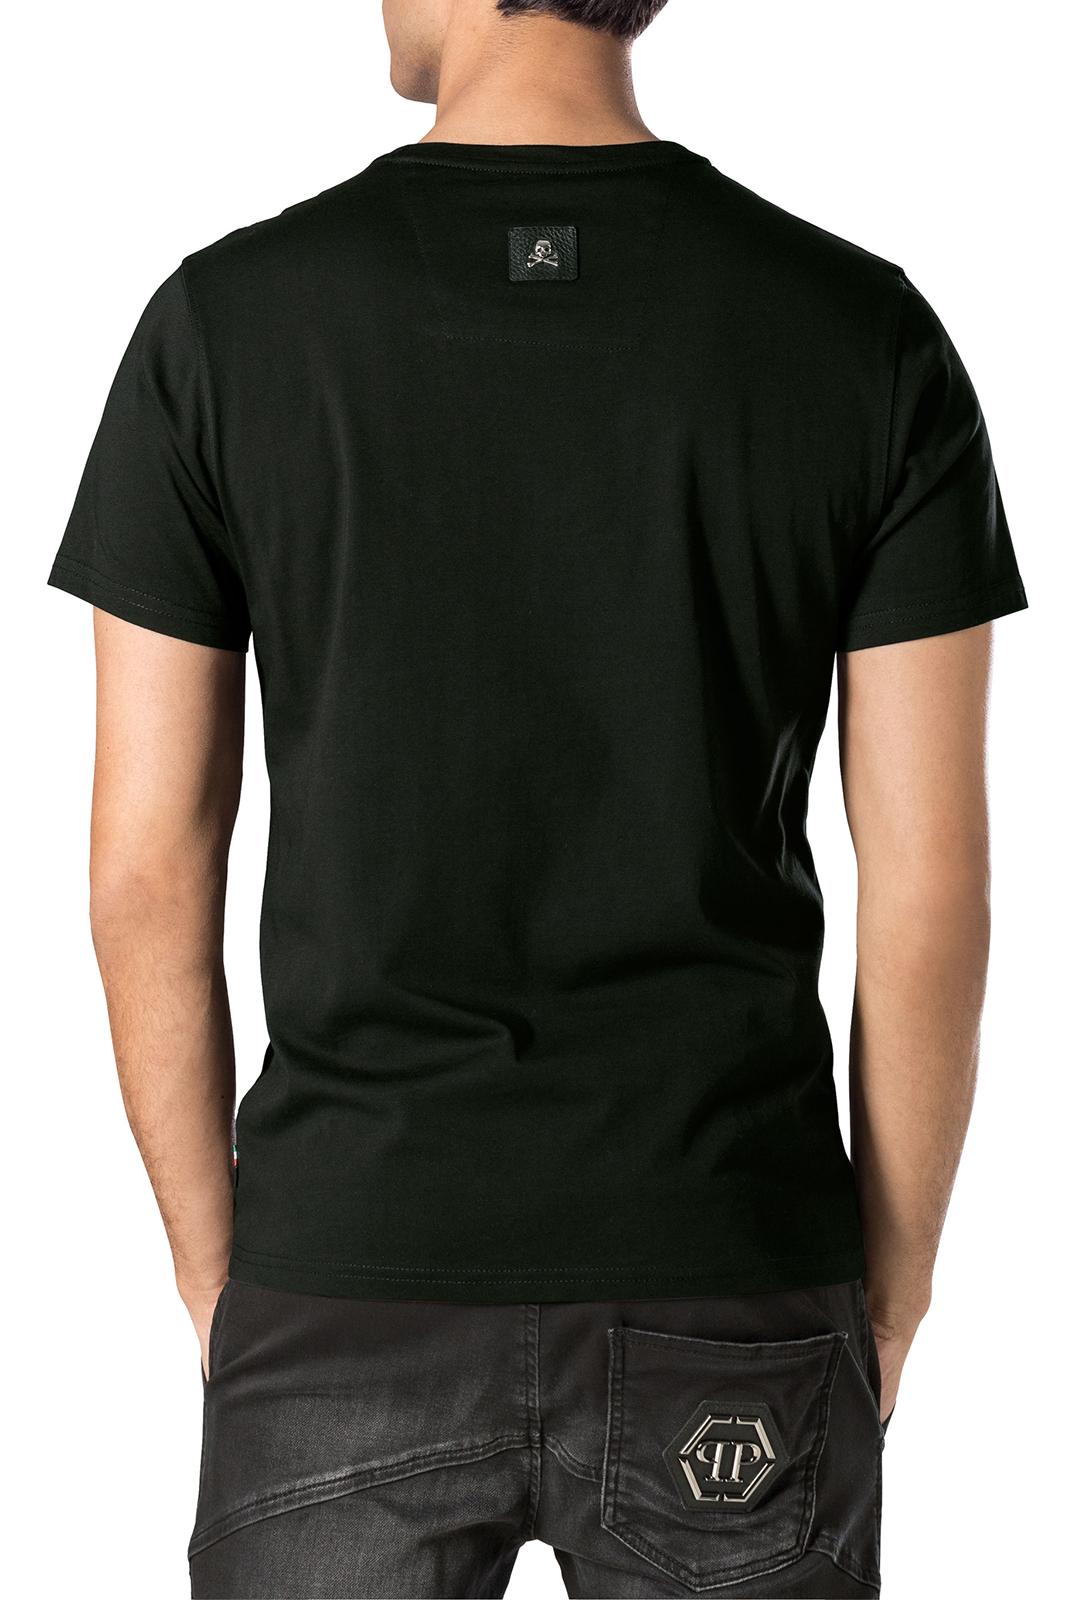 Tee-shirts  Philipp plein MTK1014 UME 0202 BLACK/BLACK